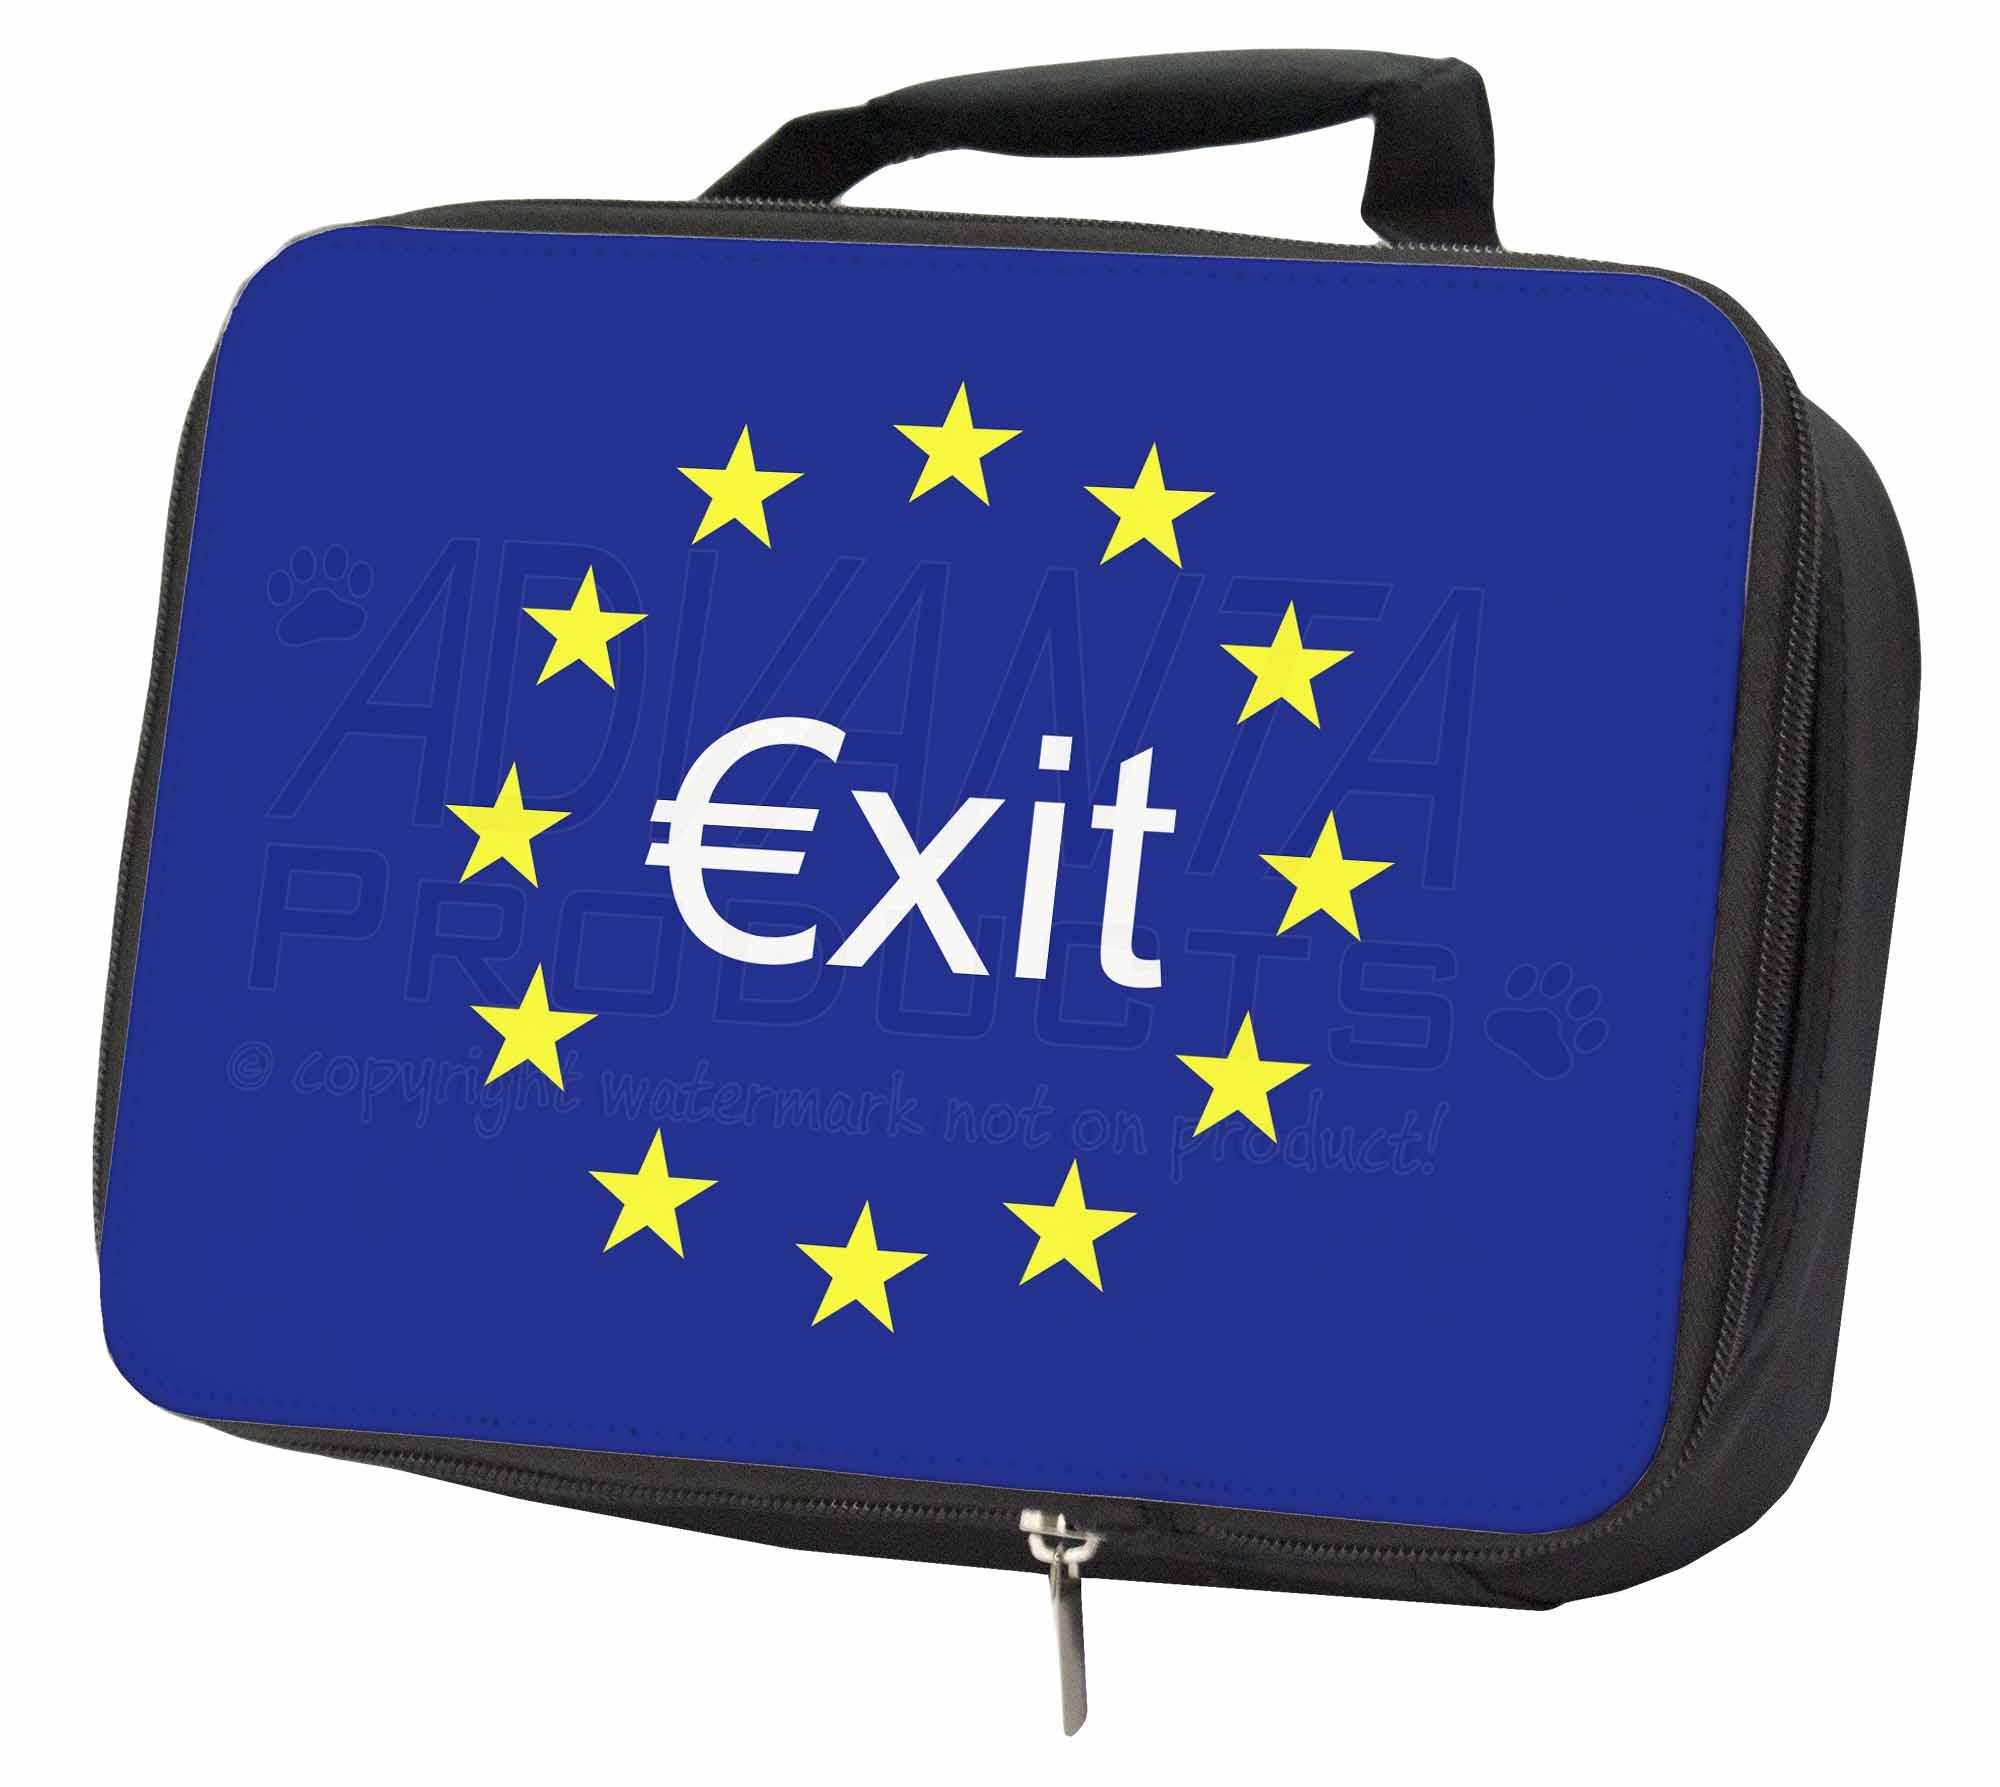 British Brexit, Euro 'exit' Black Insulated School Lunch Box Bag, British-2lbb